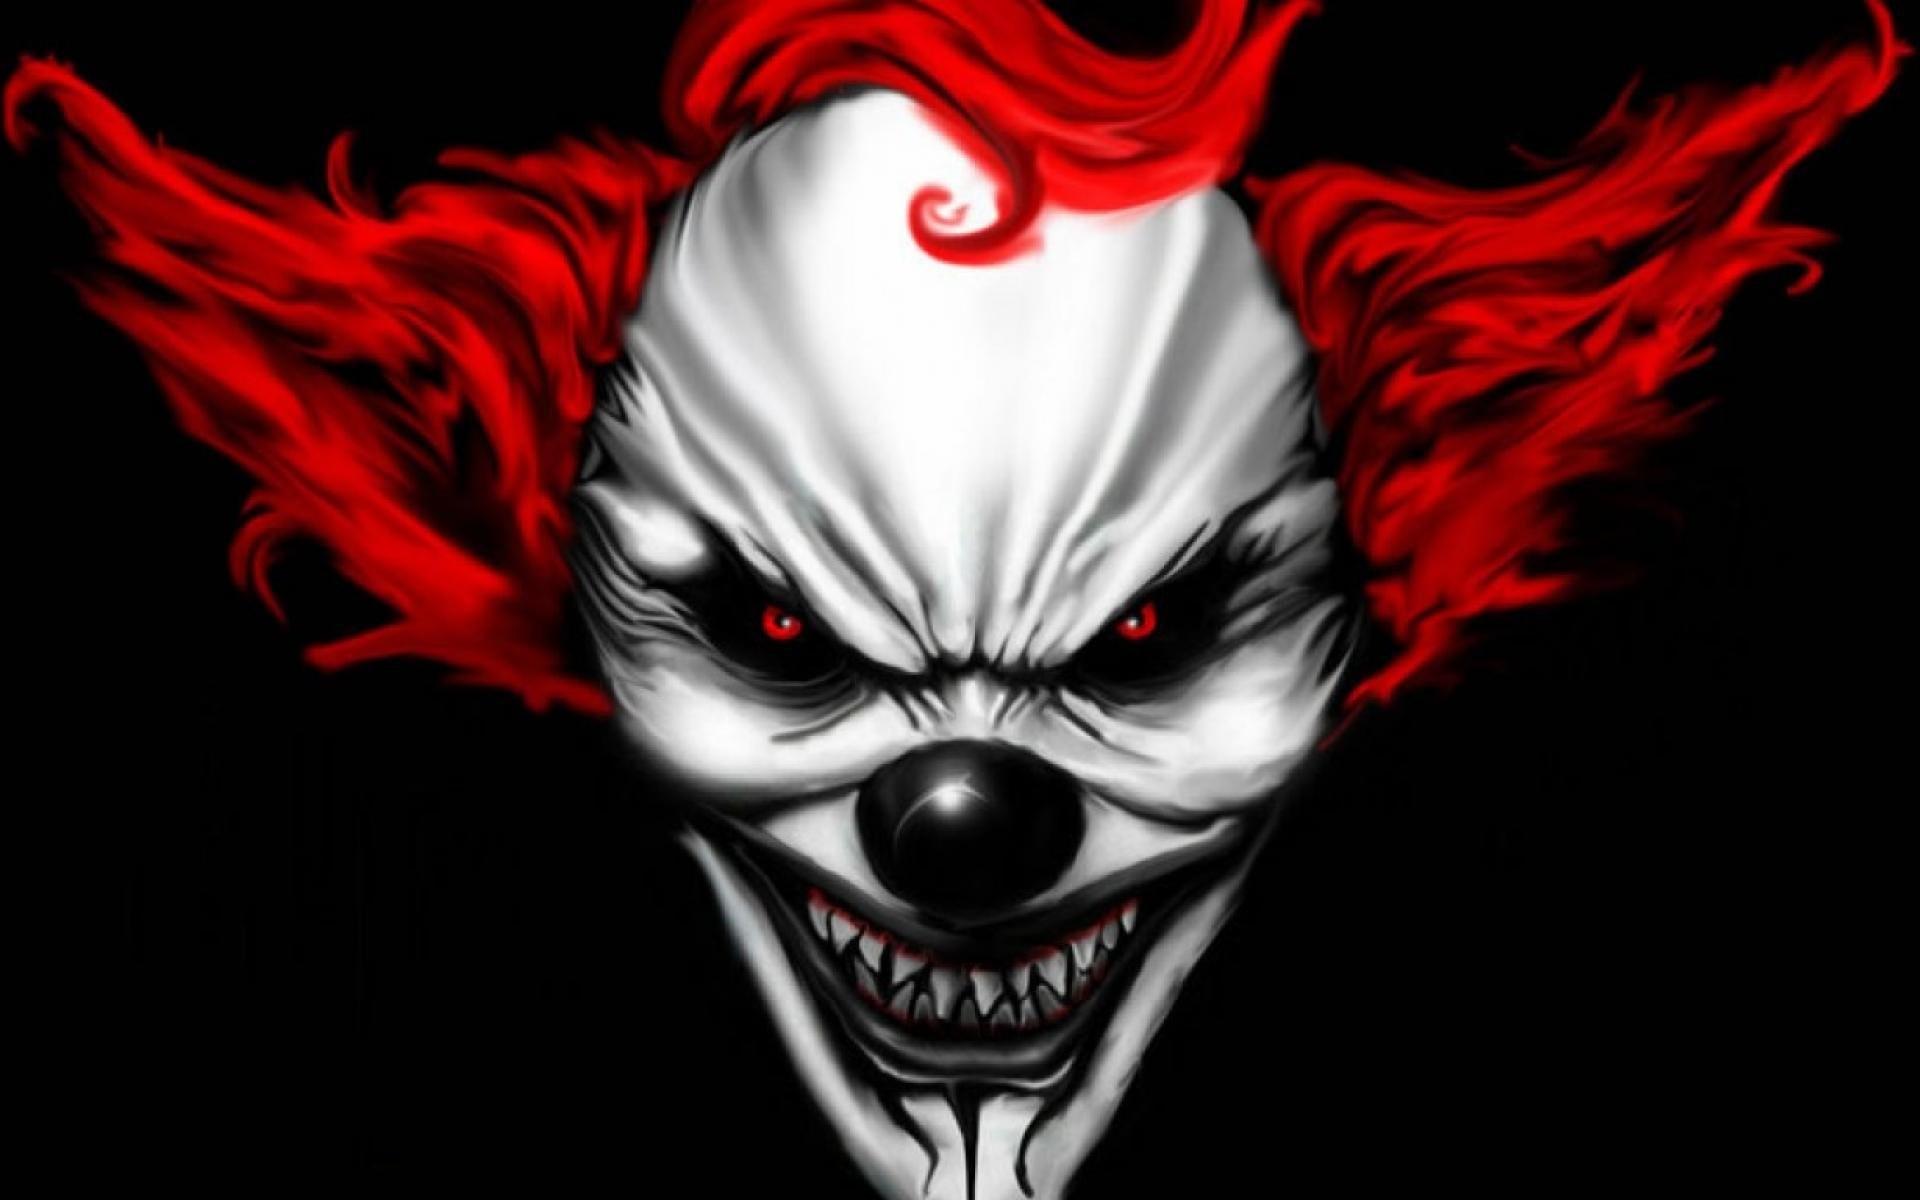 Res: 1920x1200, Dark - Clown Scary Evil Face Dark Creepy Wallpaper